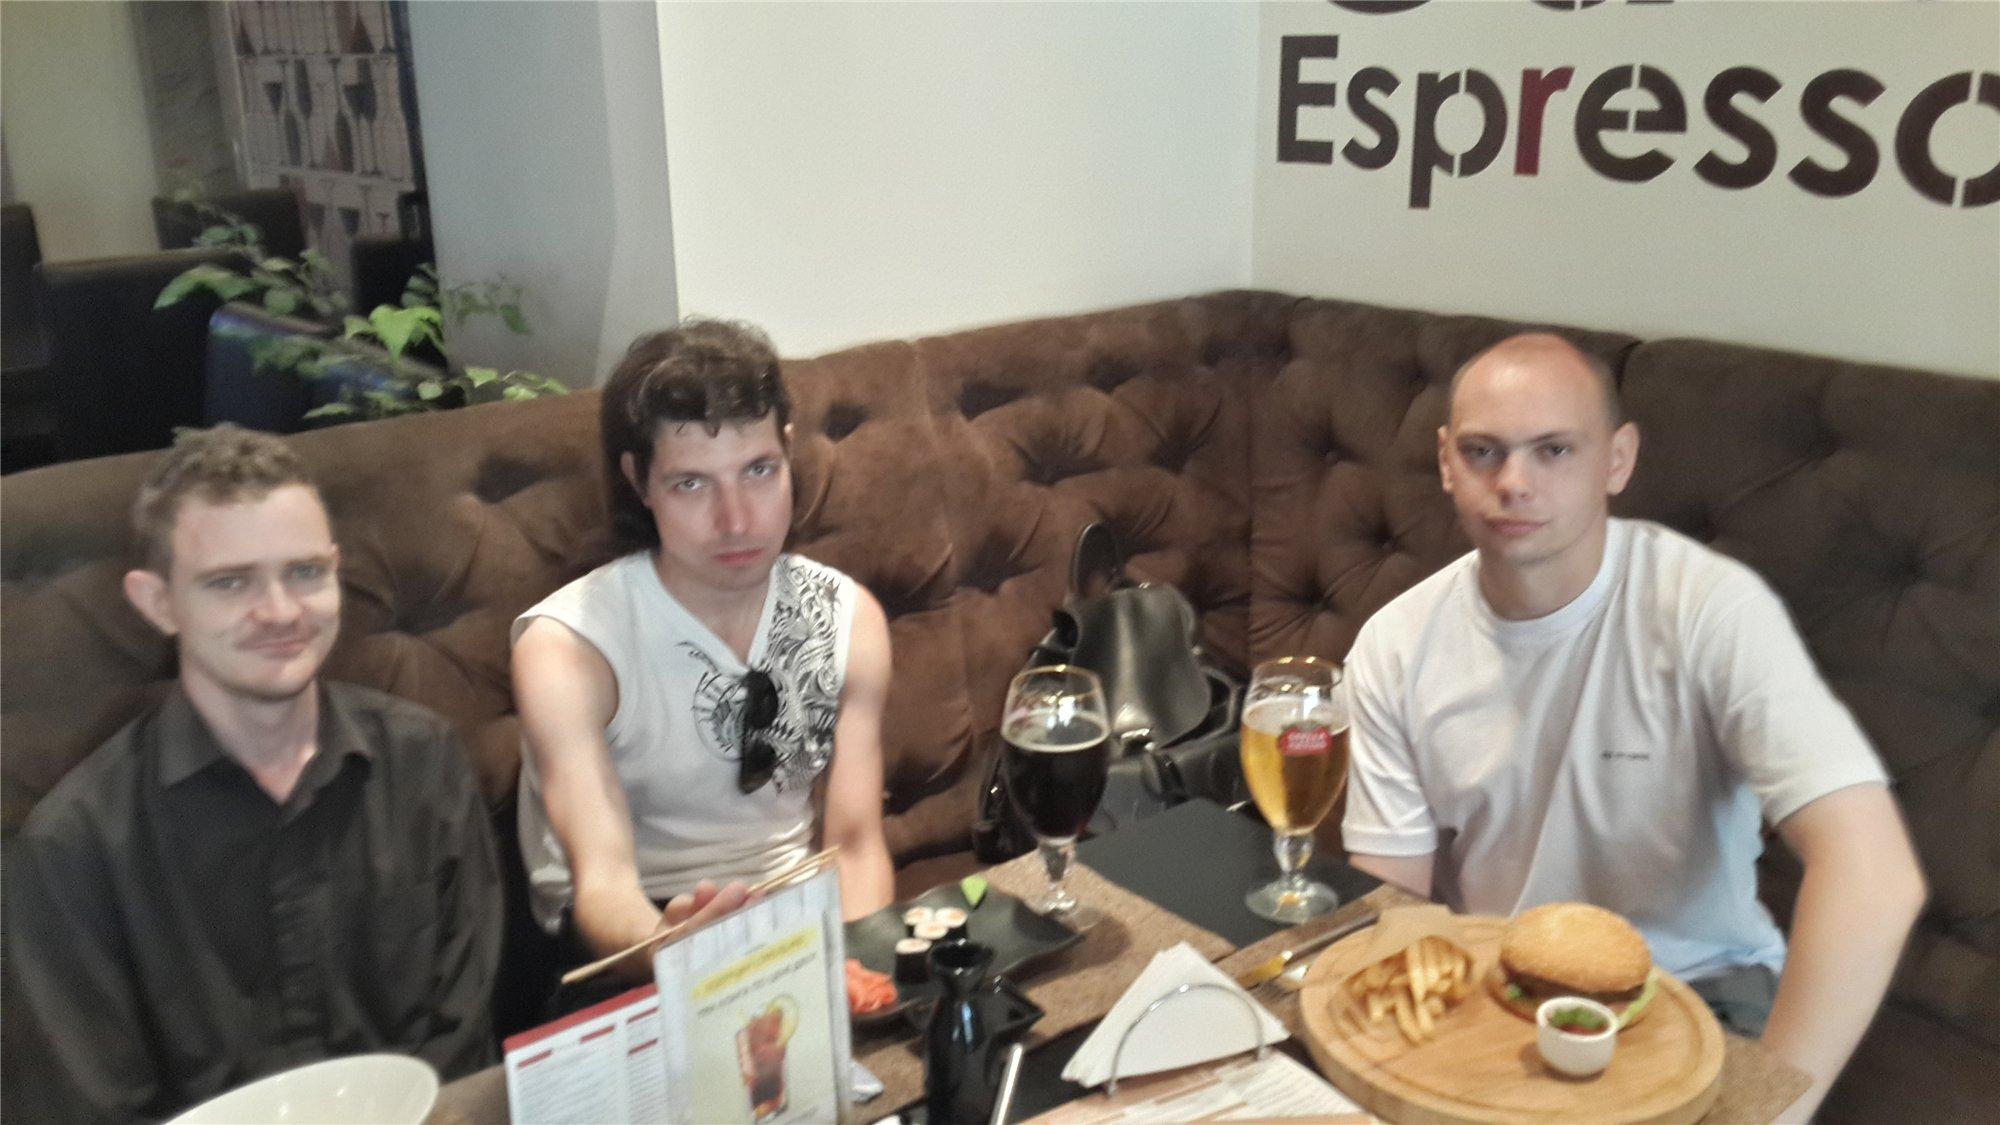 (слева направо) Кориолан, Лэнс, Александр... Фотографирует - димаметал.